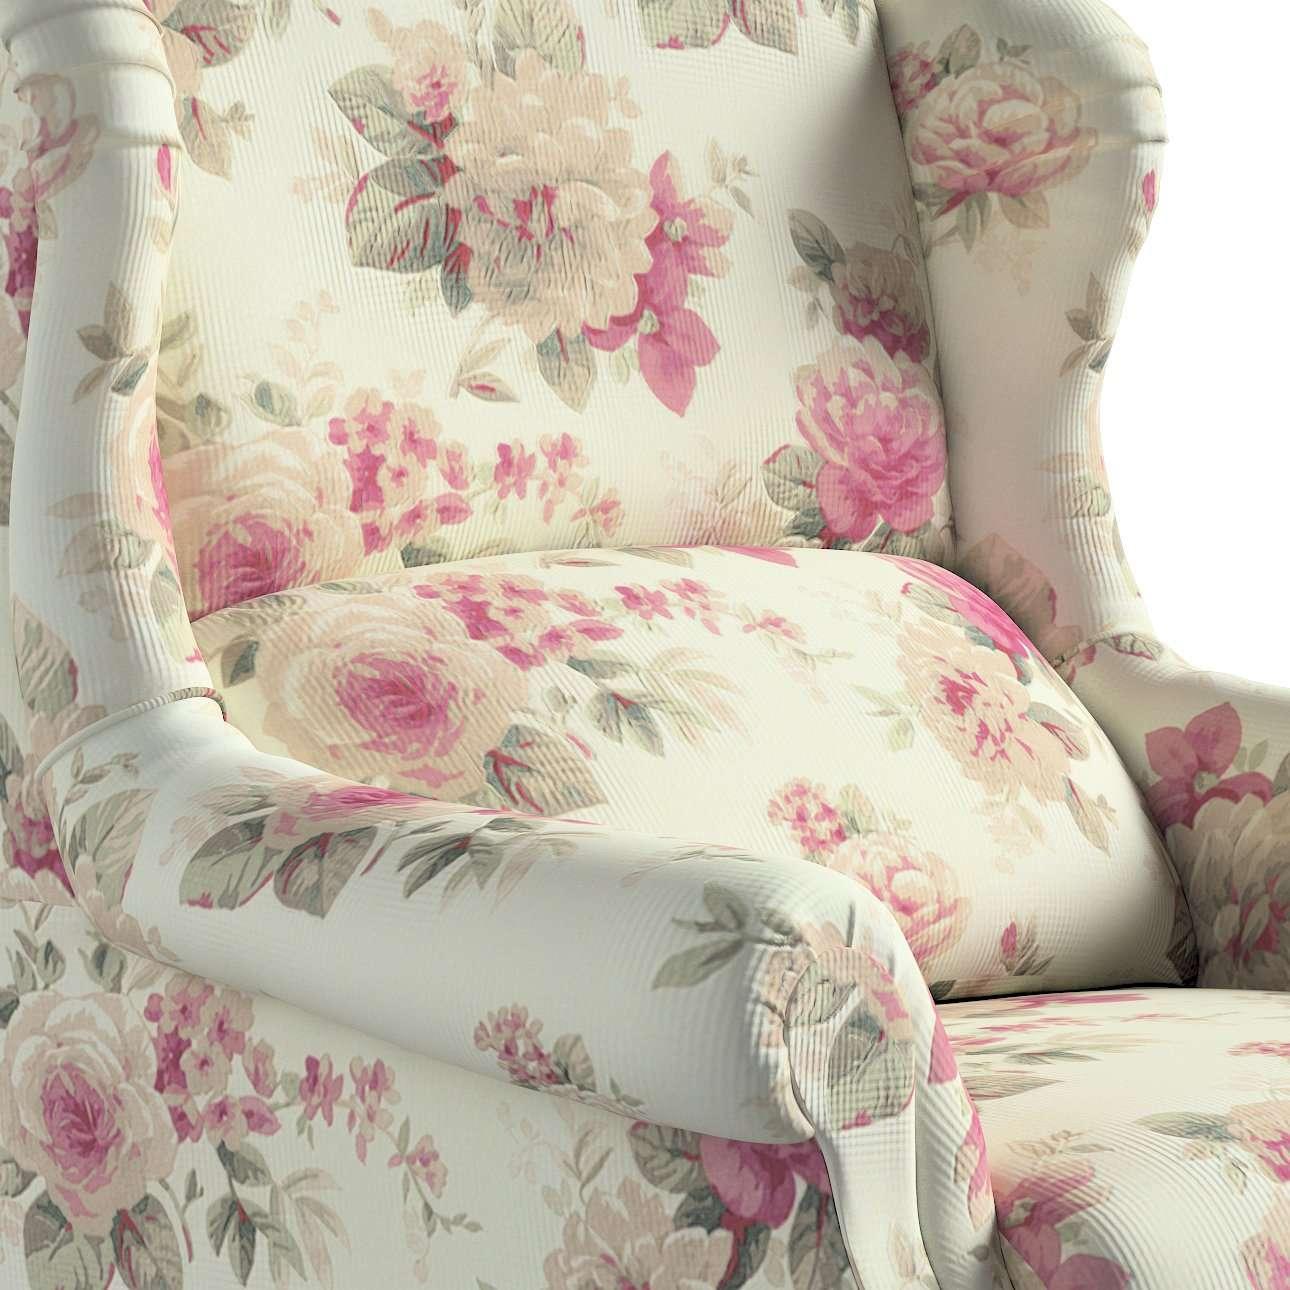 Stilingas Dekoria fotelis 63 x 115 cm kolekcijoje Mirella, audinys: 141-07